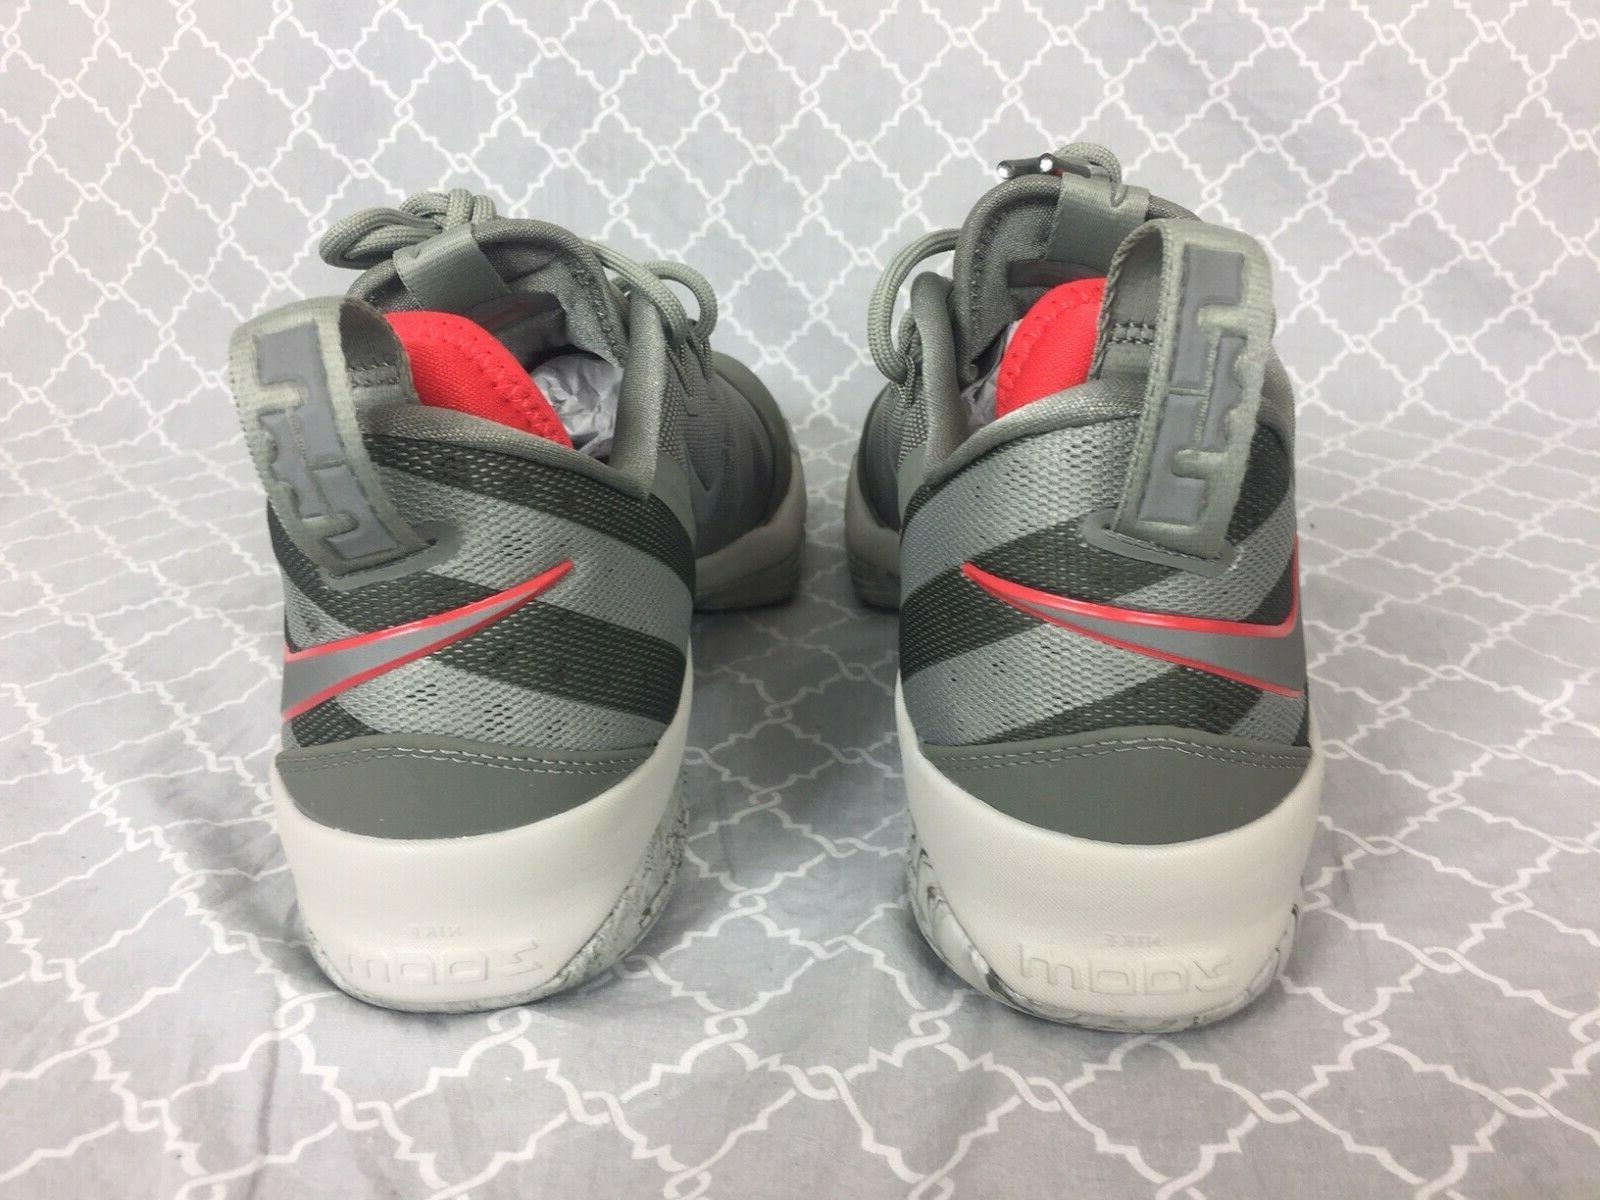 Nike XIV Stucco Multi Sizes